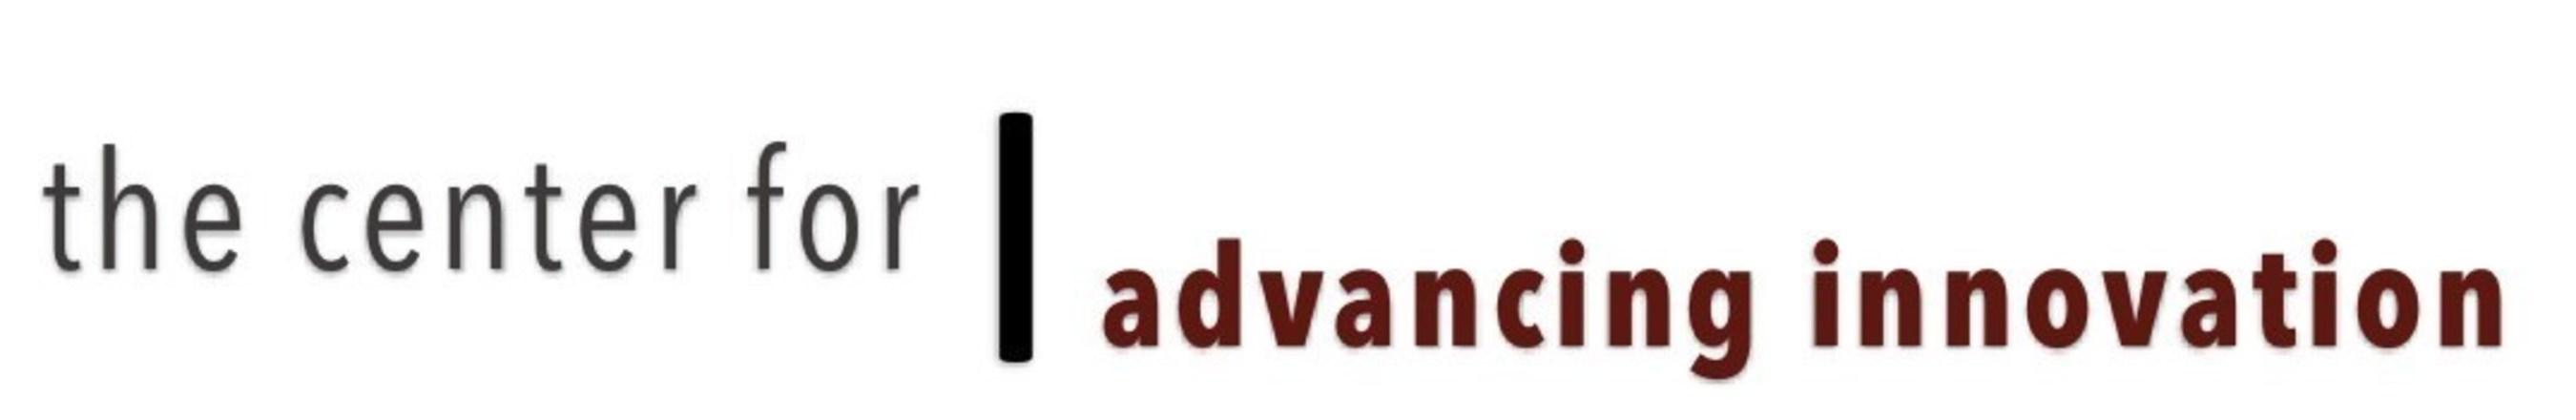 the center for advancing innovation logo (PRNewsFoto/Heritage Provider Network)